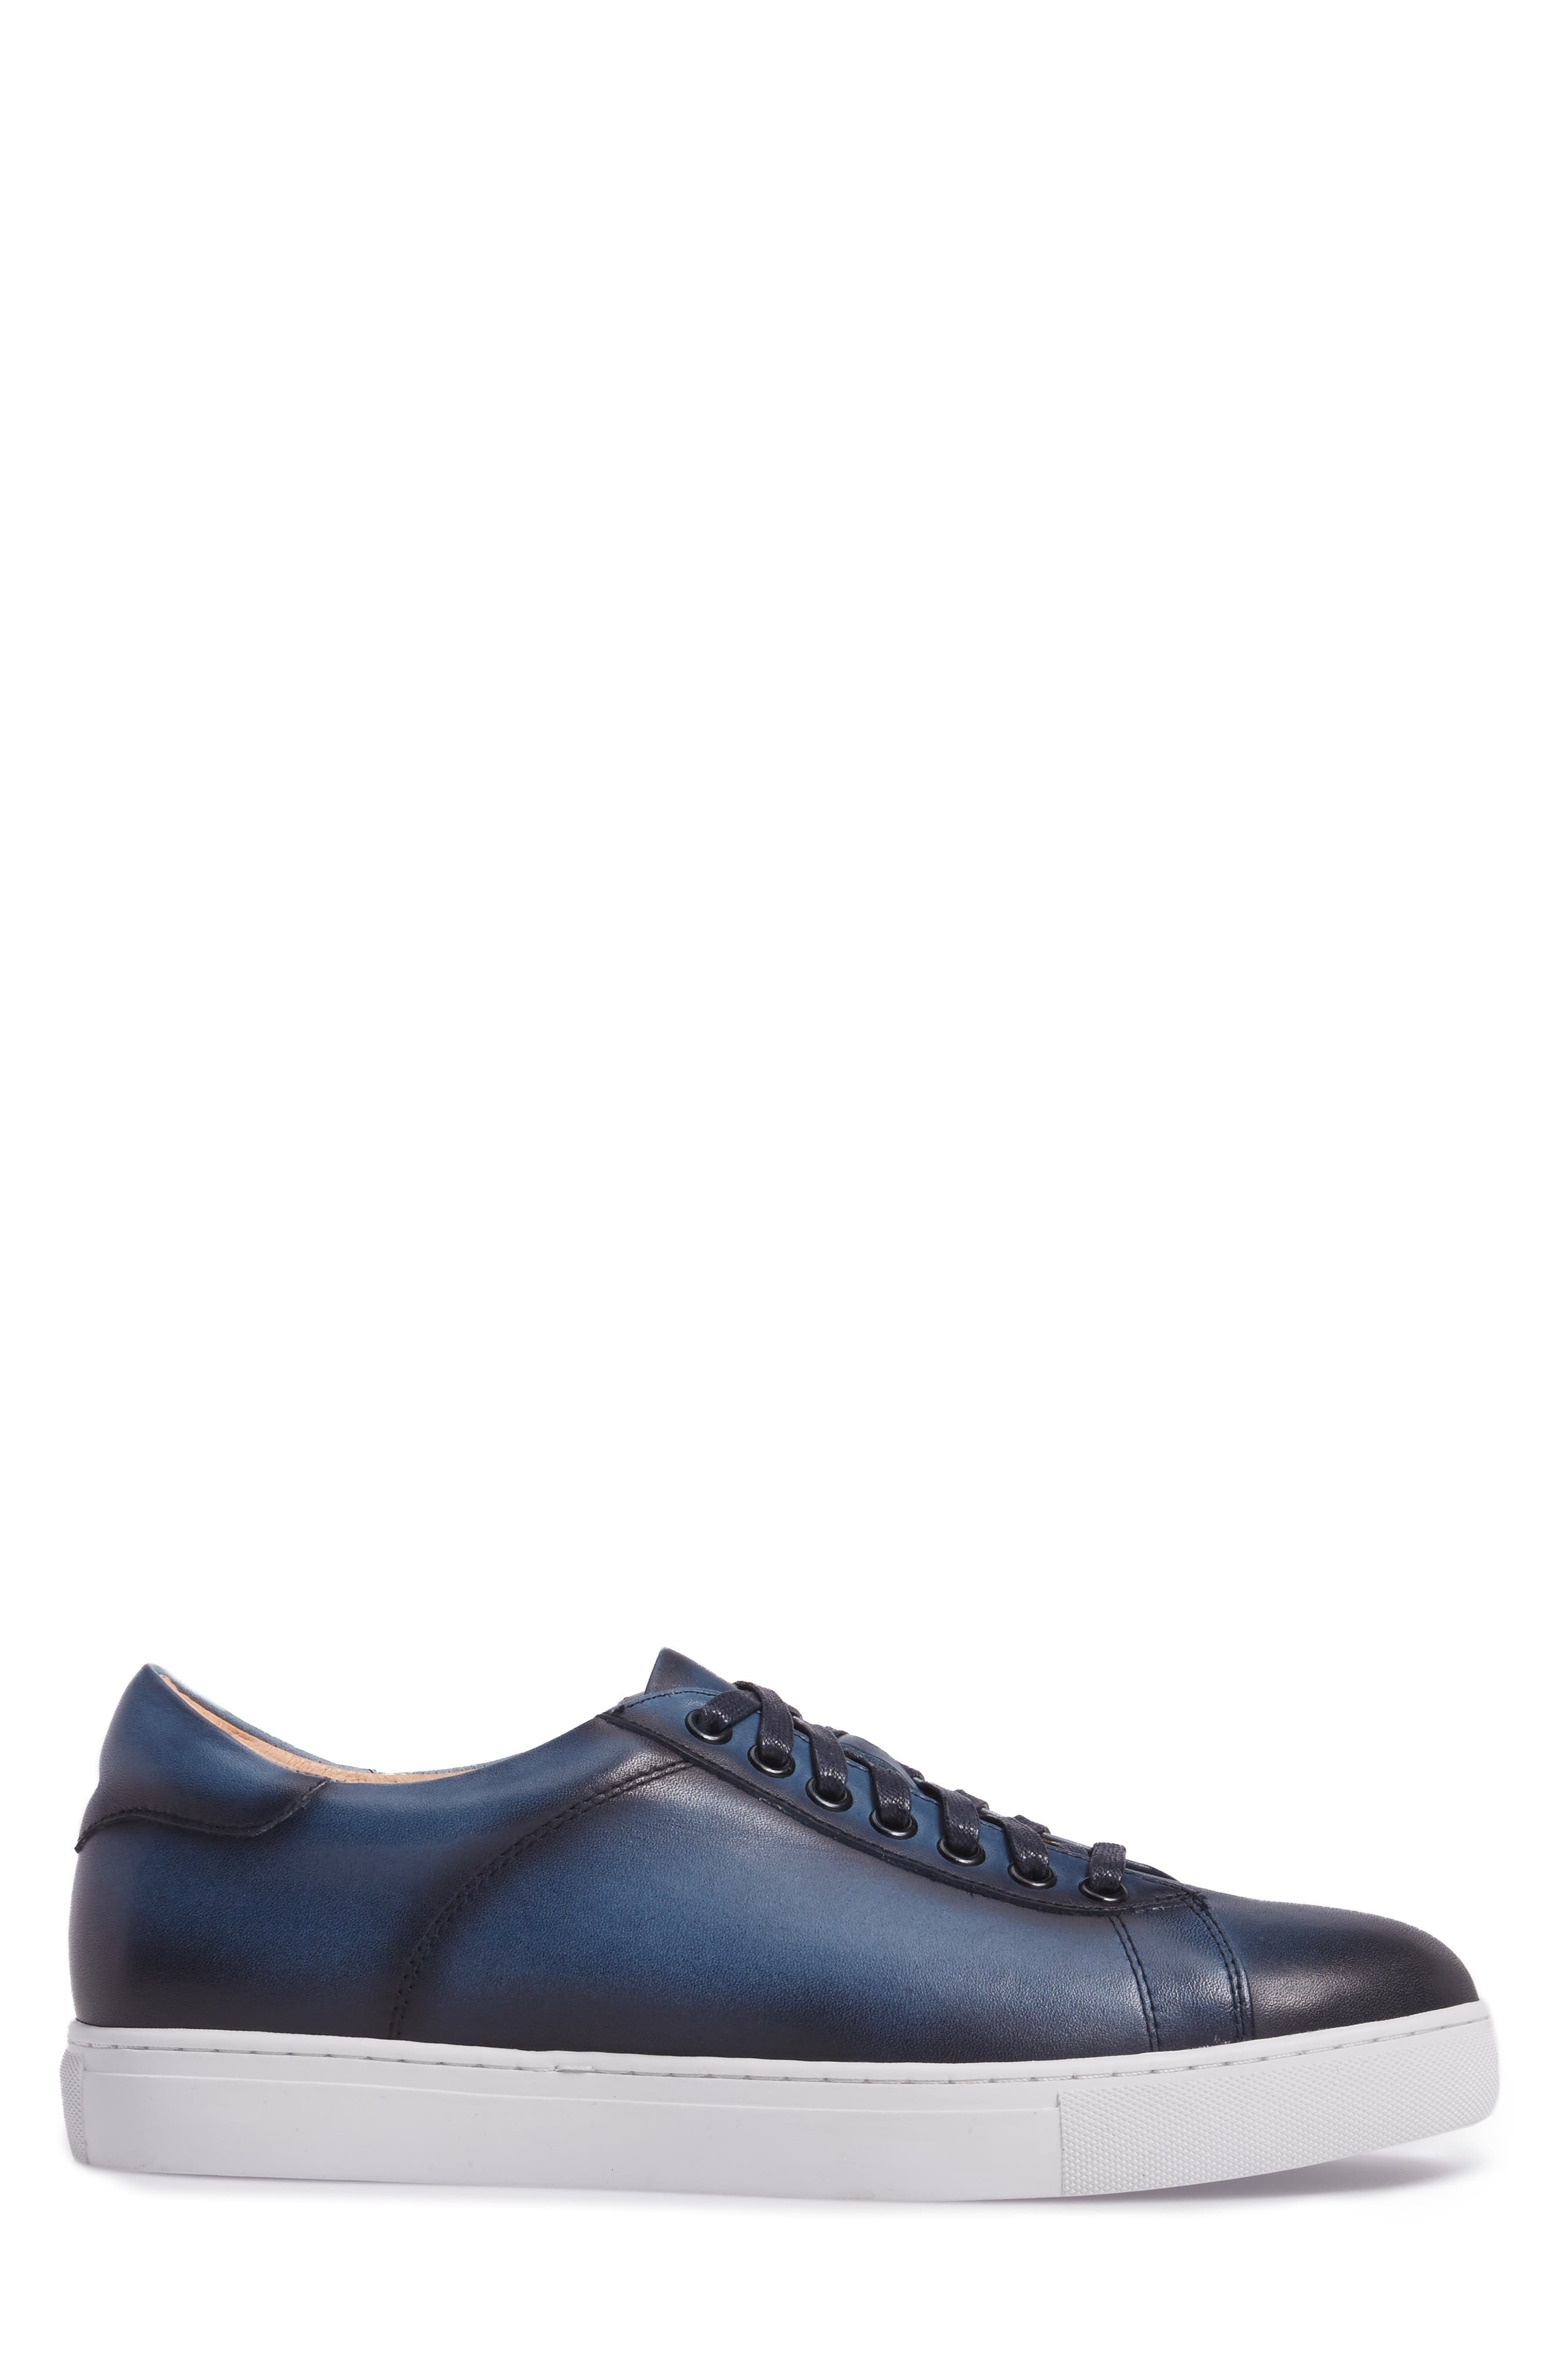 Penrose Sneaker,                             Alternate thumbnail 3, color,                             Blue Leather